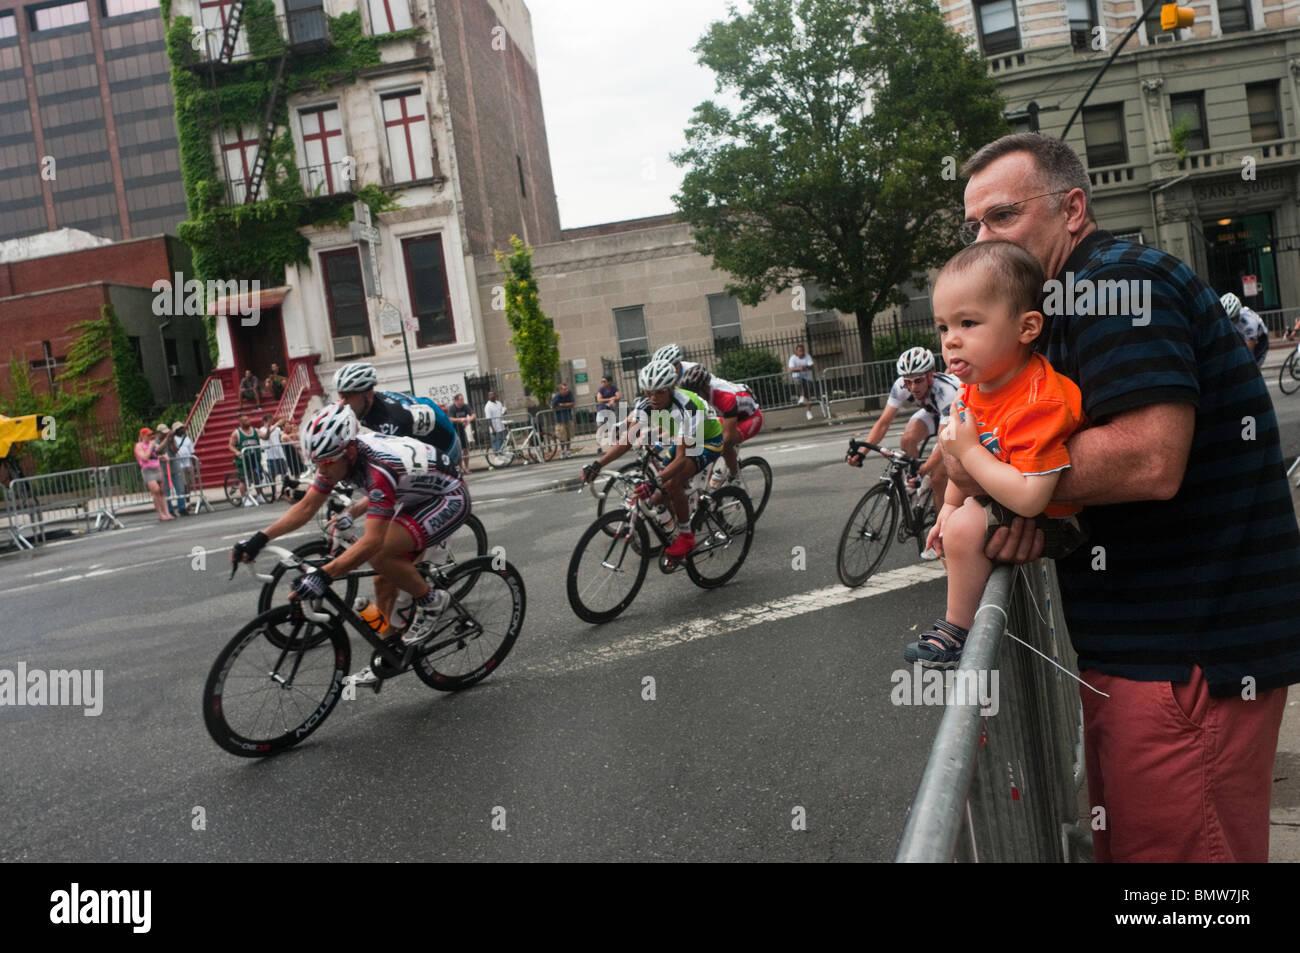 Vater und Baby beobachten die Harlem Crit Stockbild